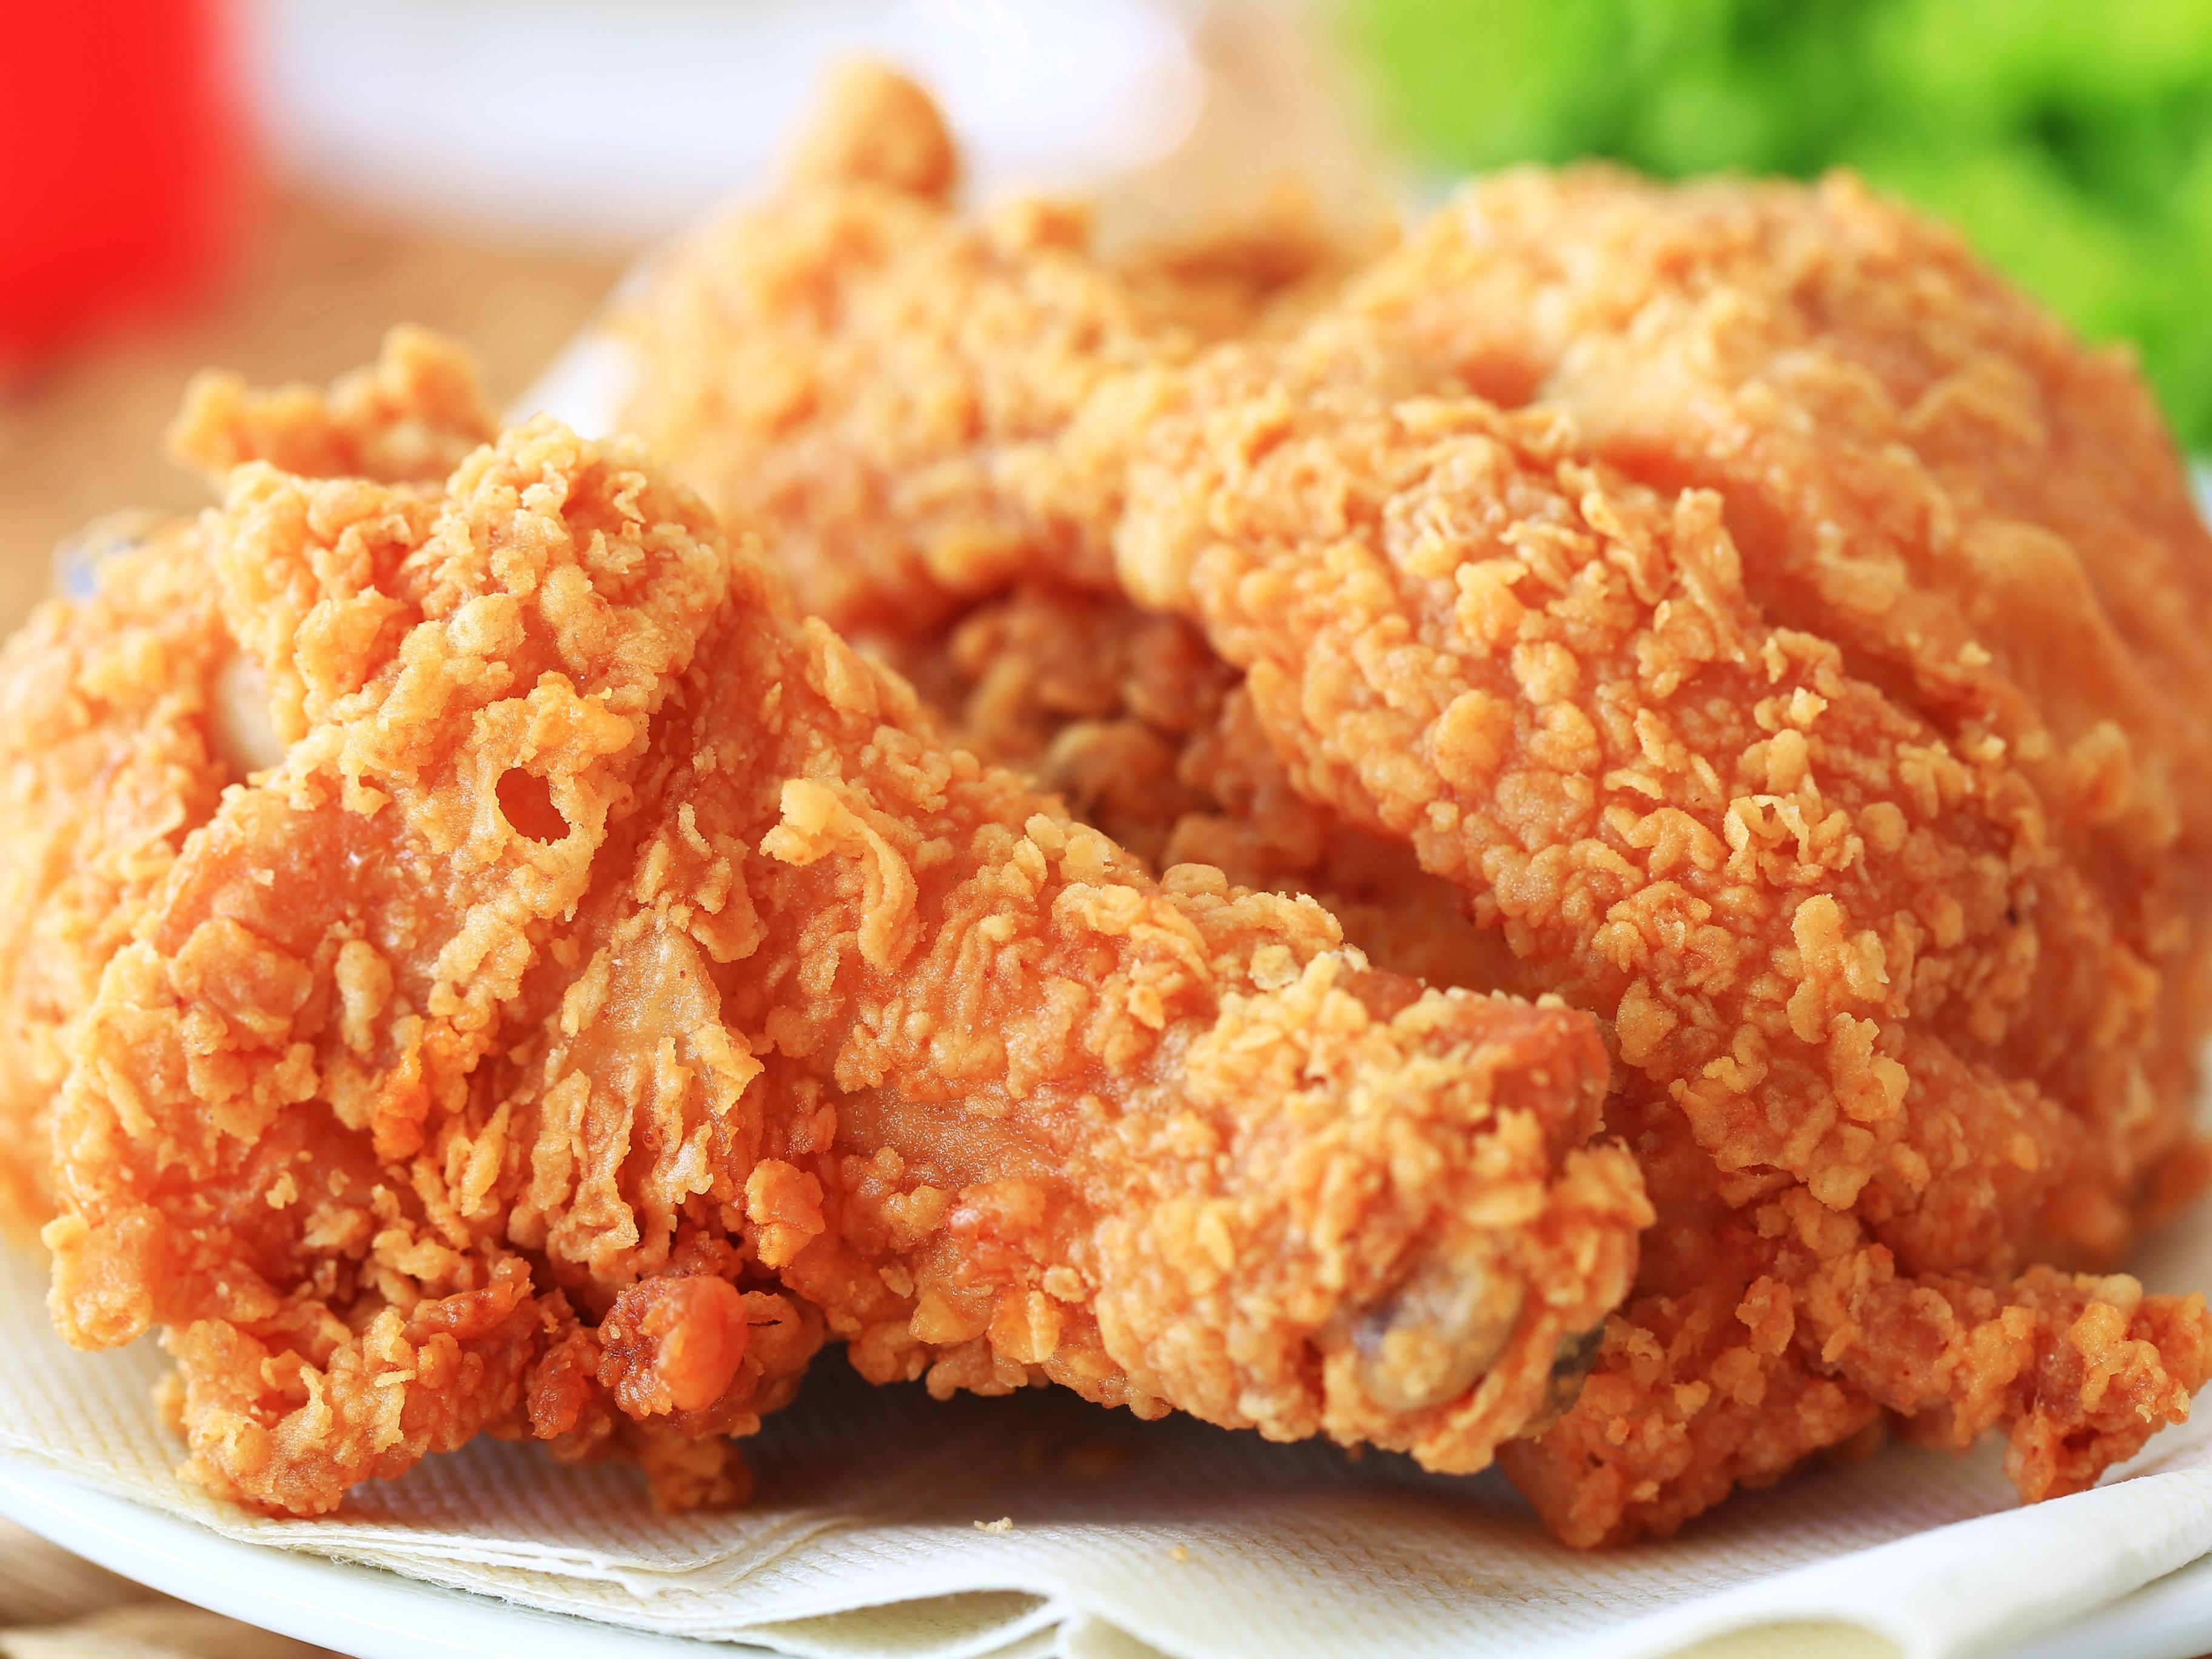 Fried Chicken Desktop